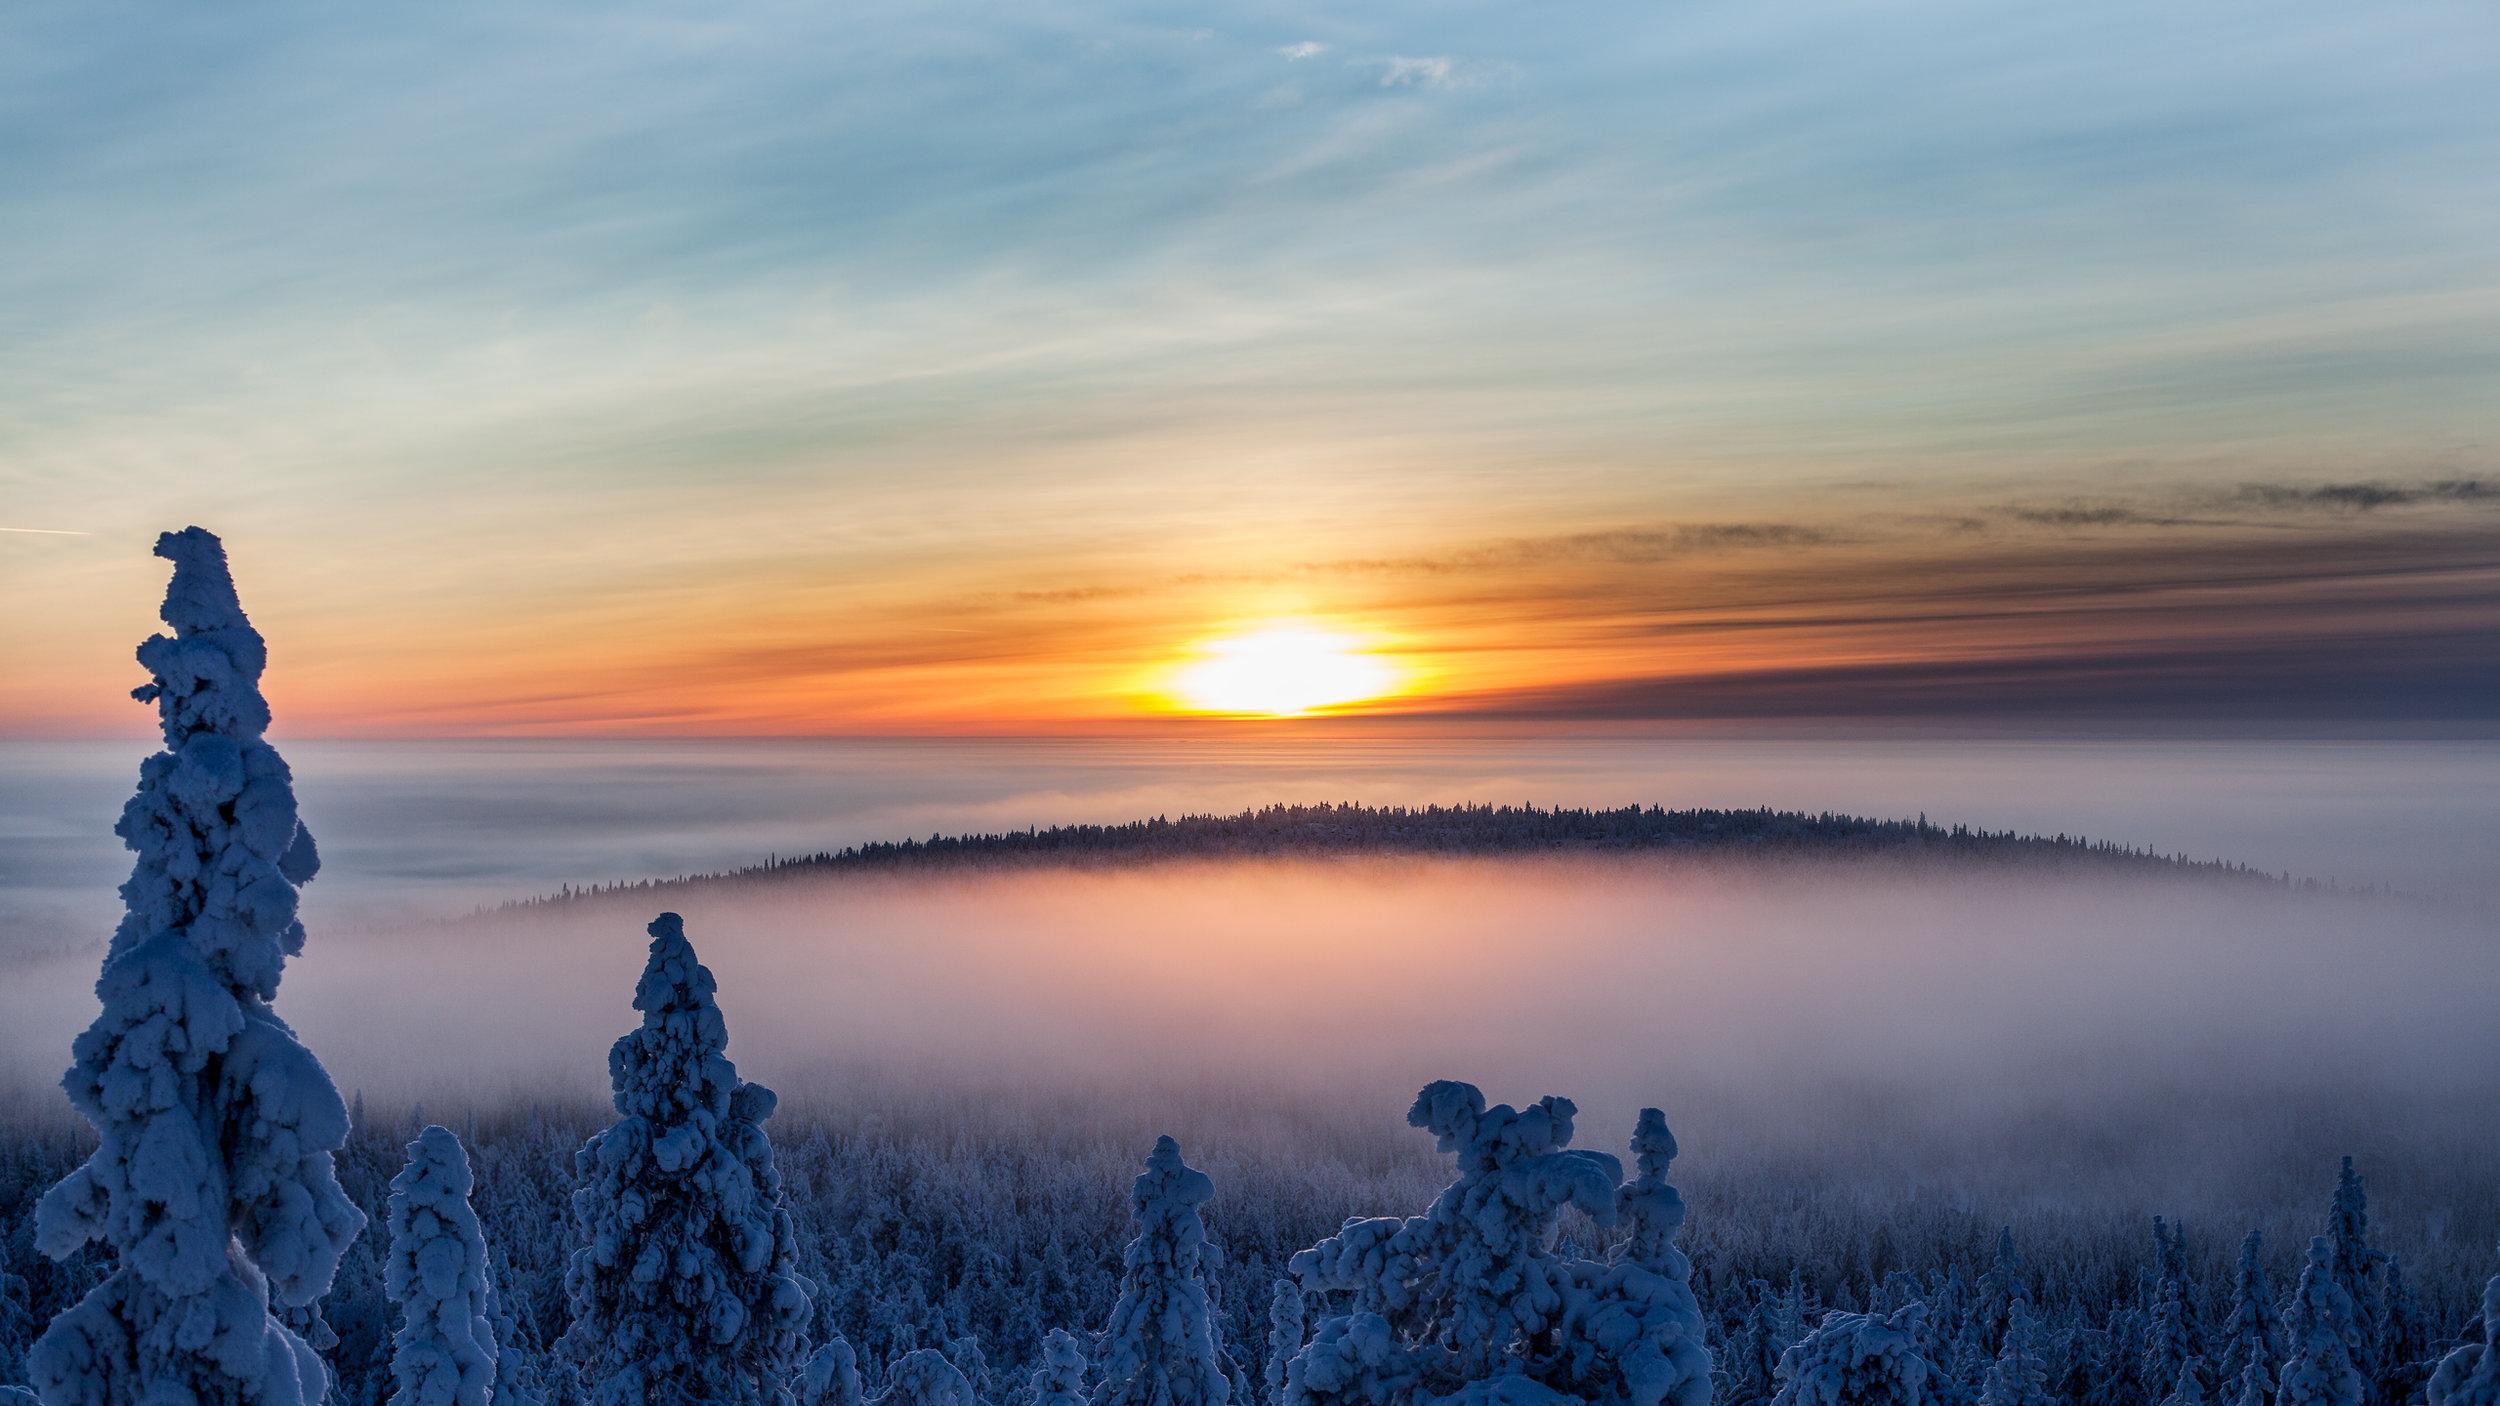 Iso-Syöte, Finland